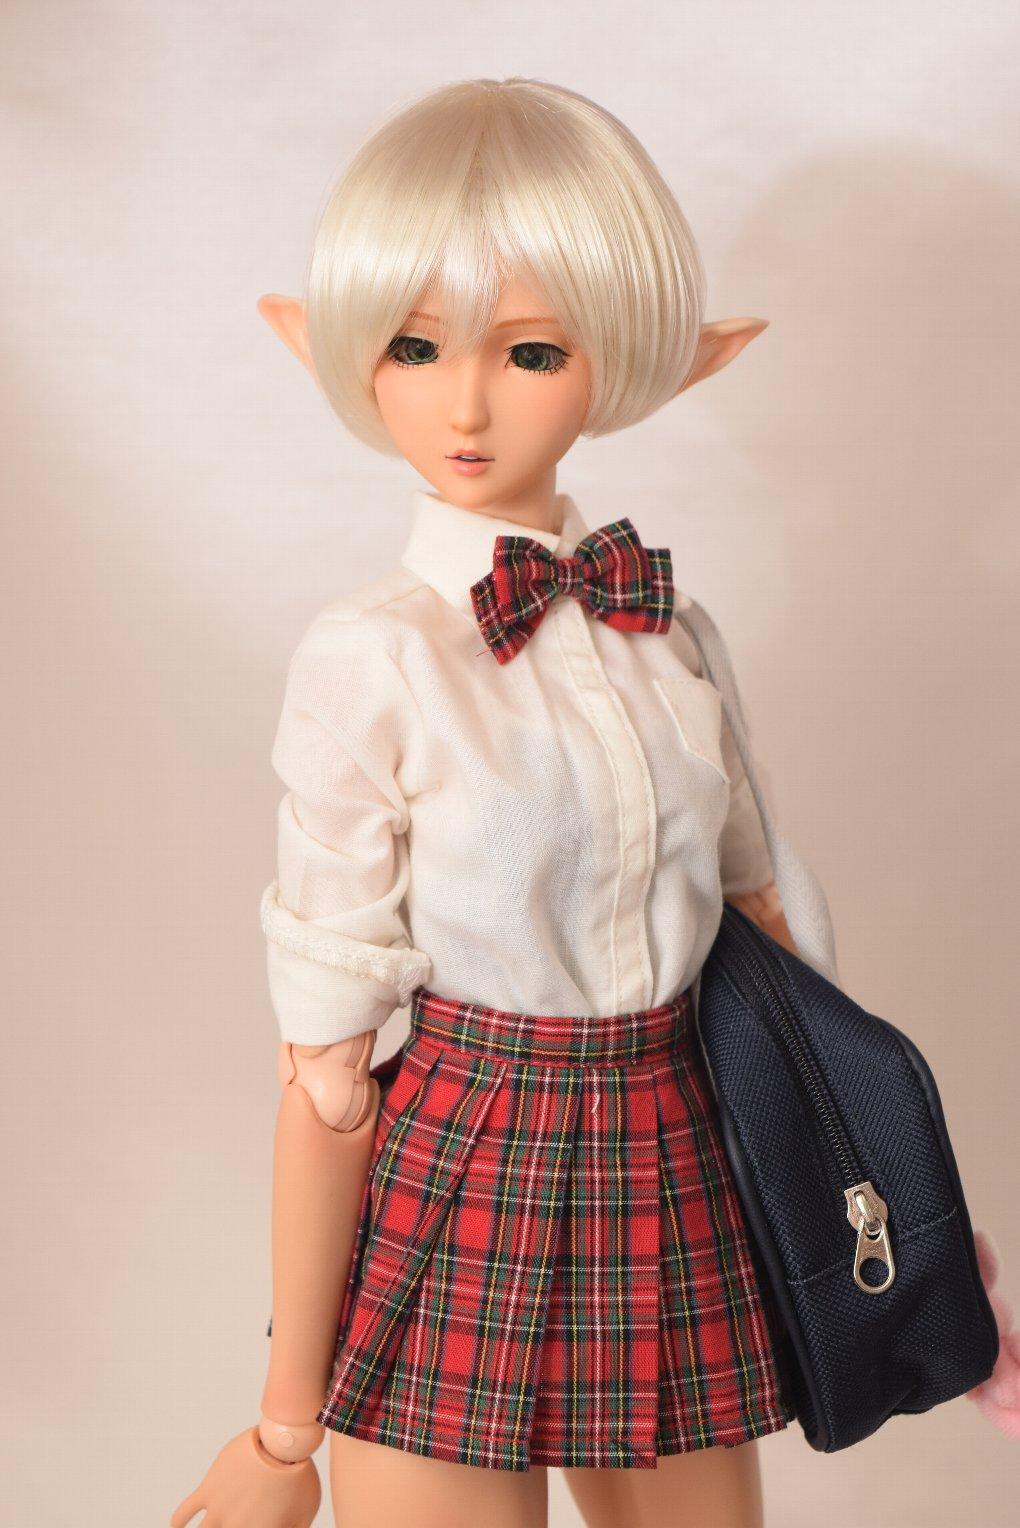 doll_3745.jpg